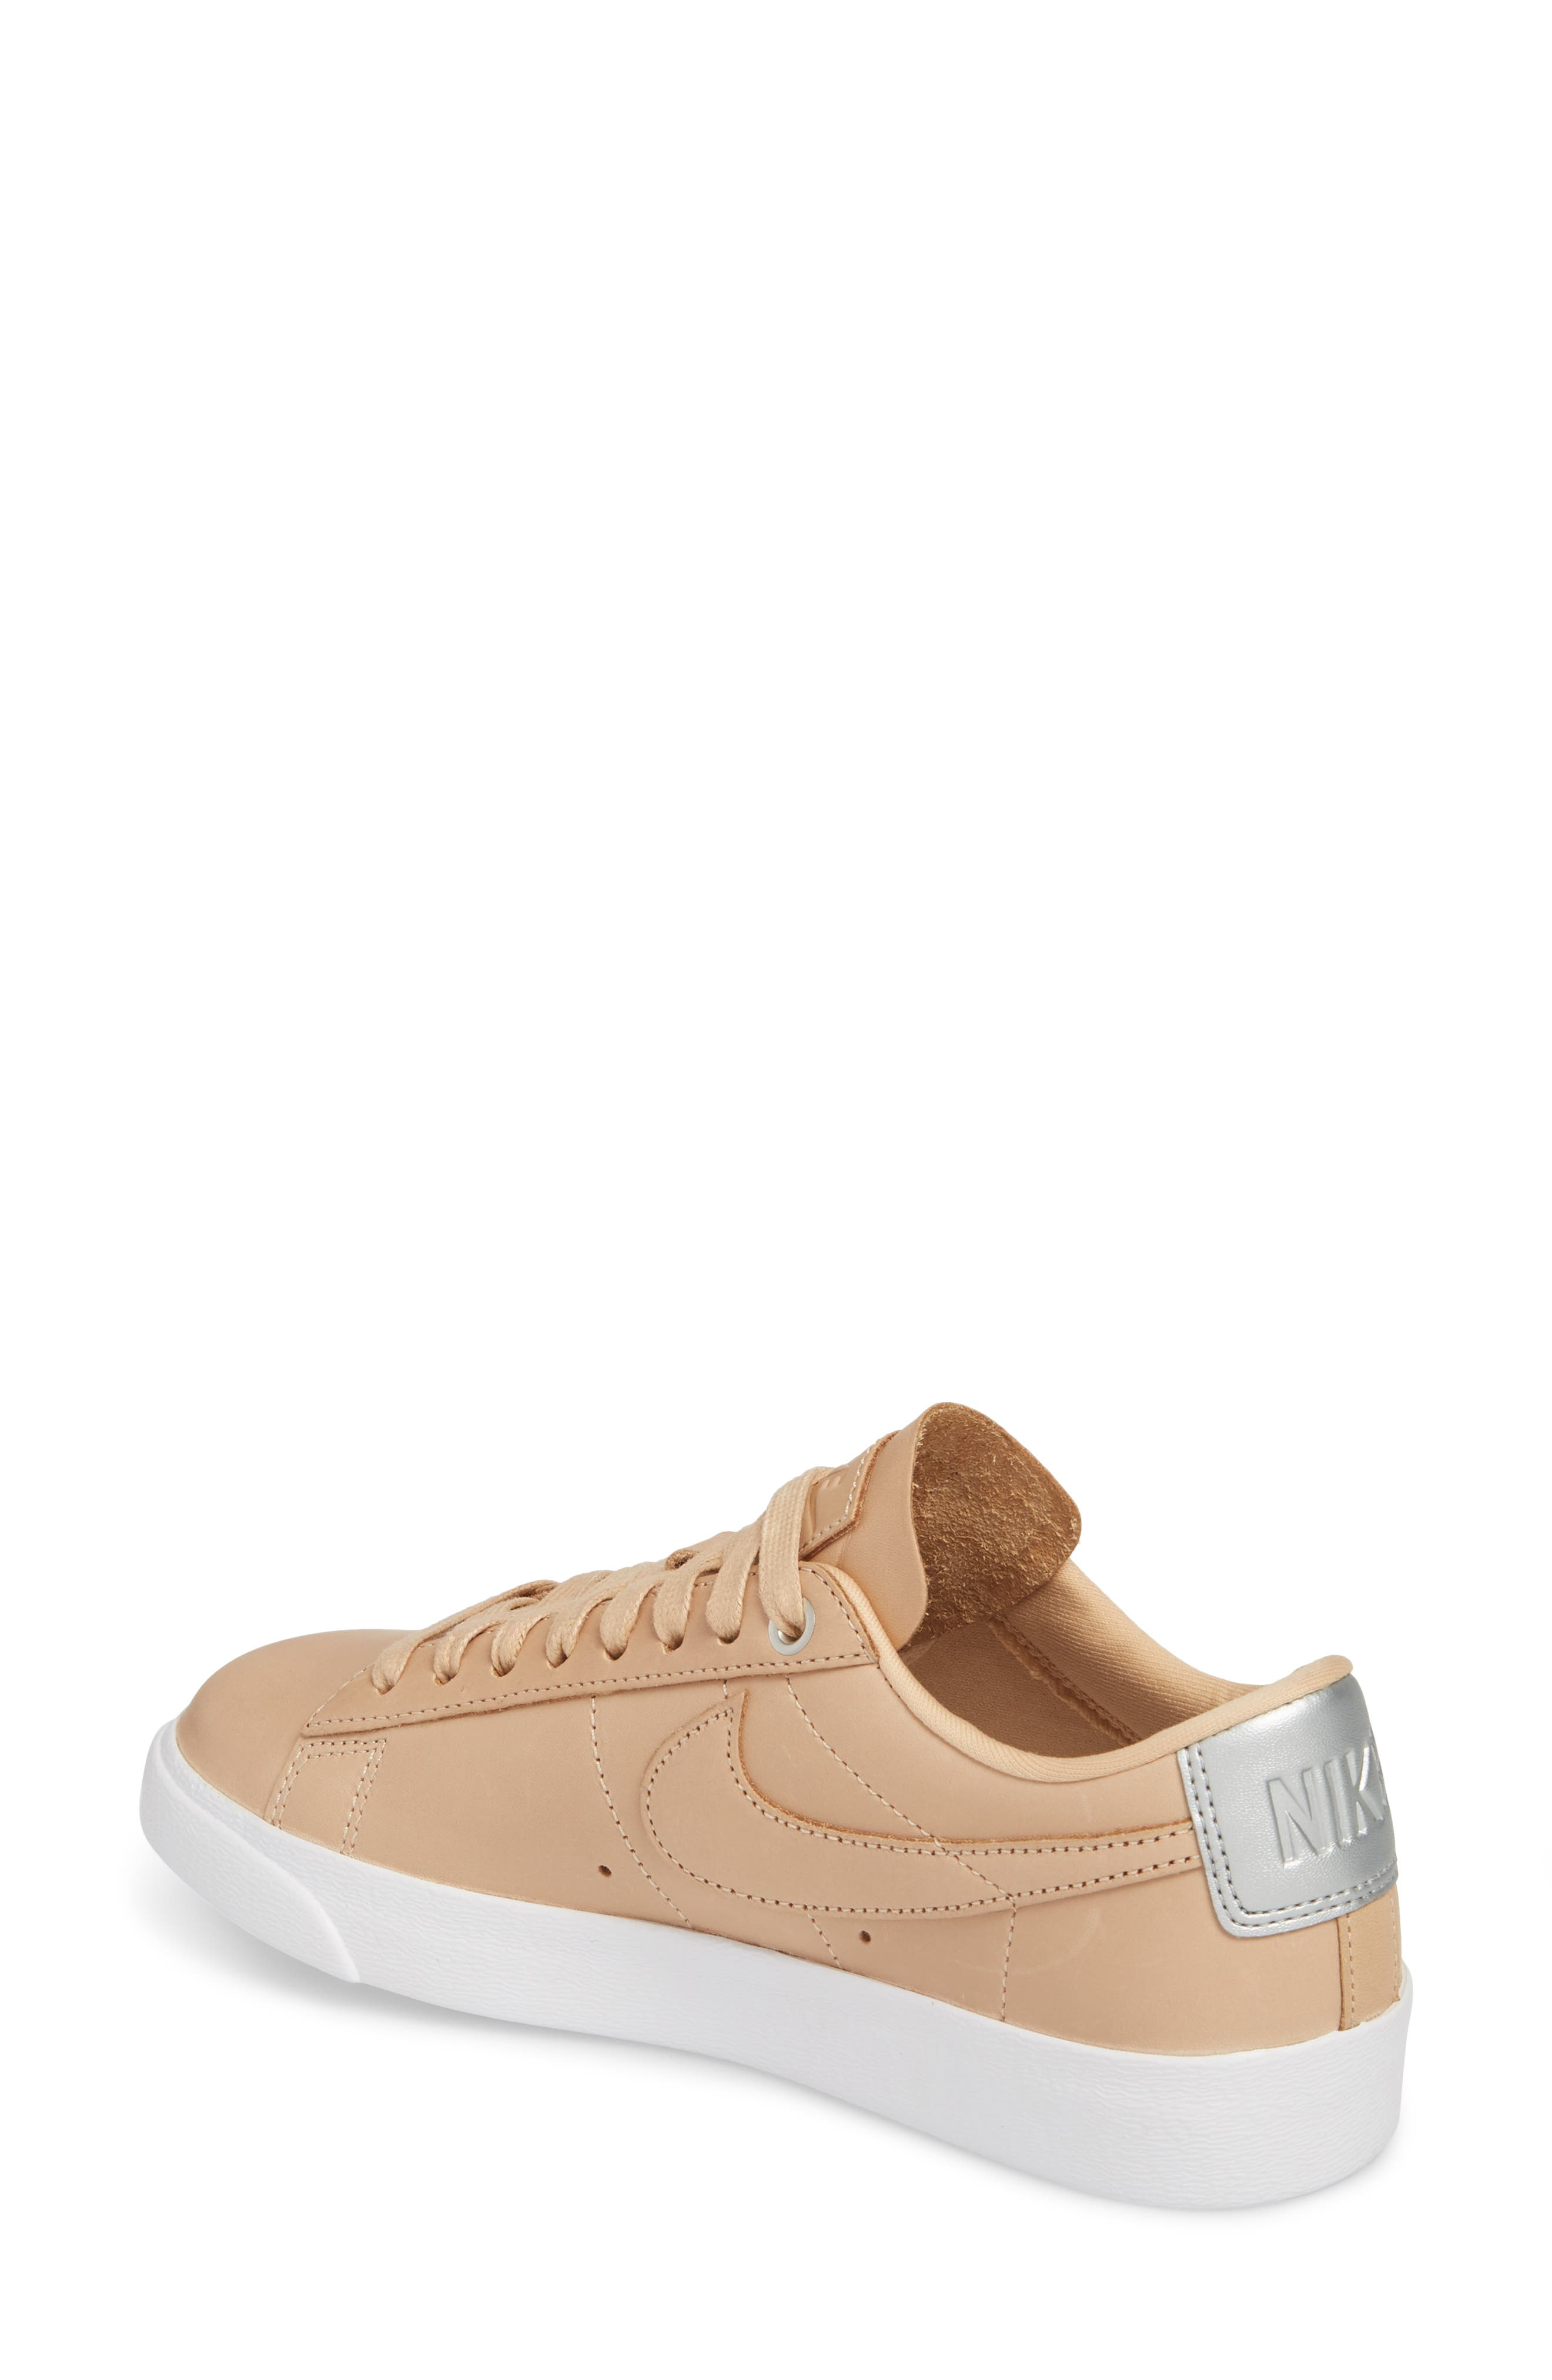 Blazer Low Top Sneaker SE,                             Alternate thumbnail 2, color,                             BIO BEIGE/ BIO BEIGE